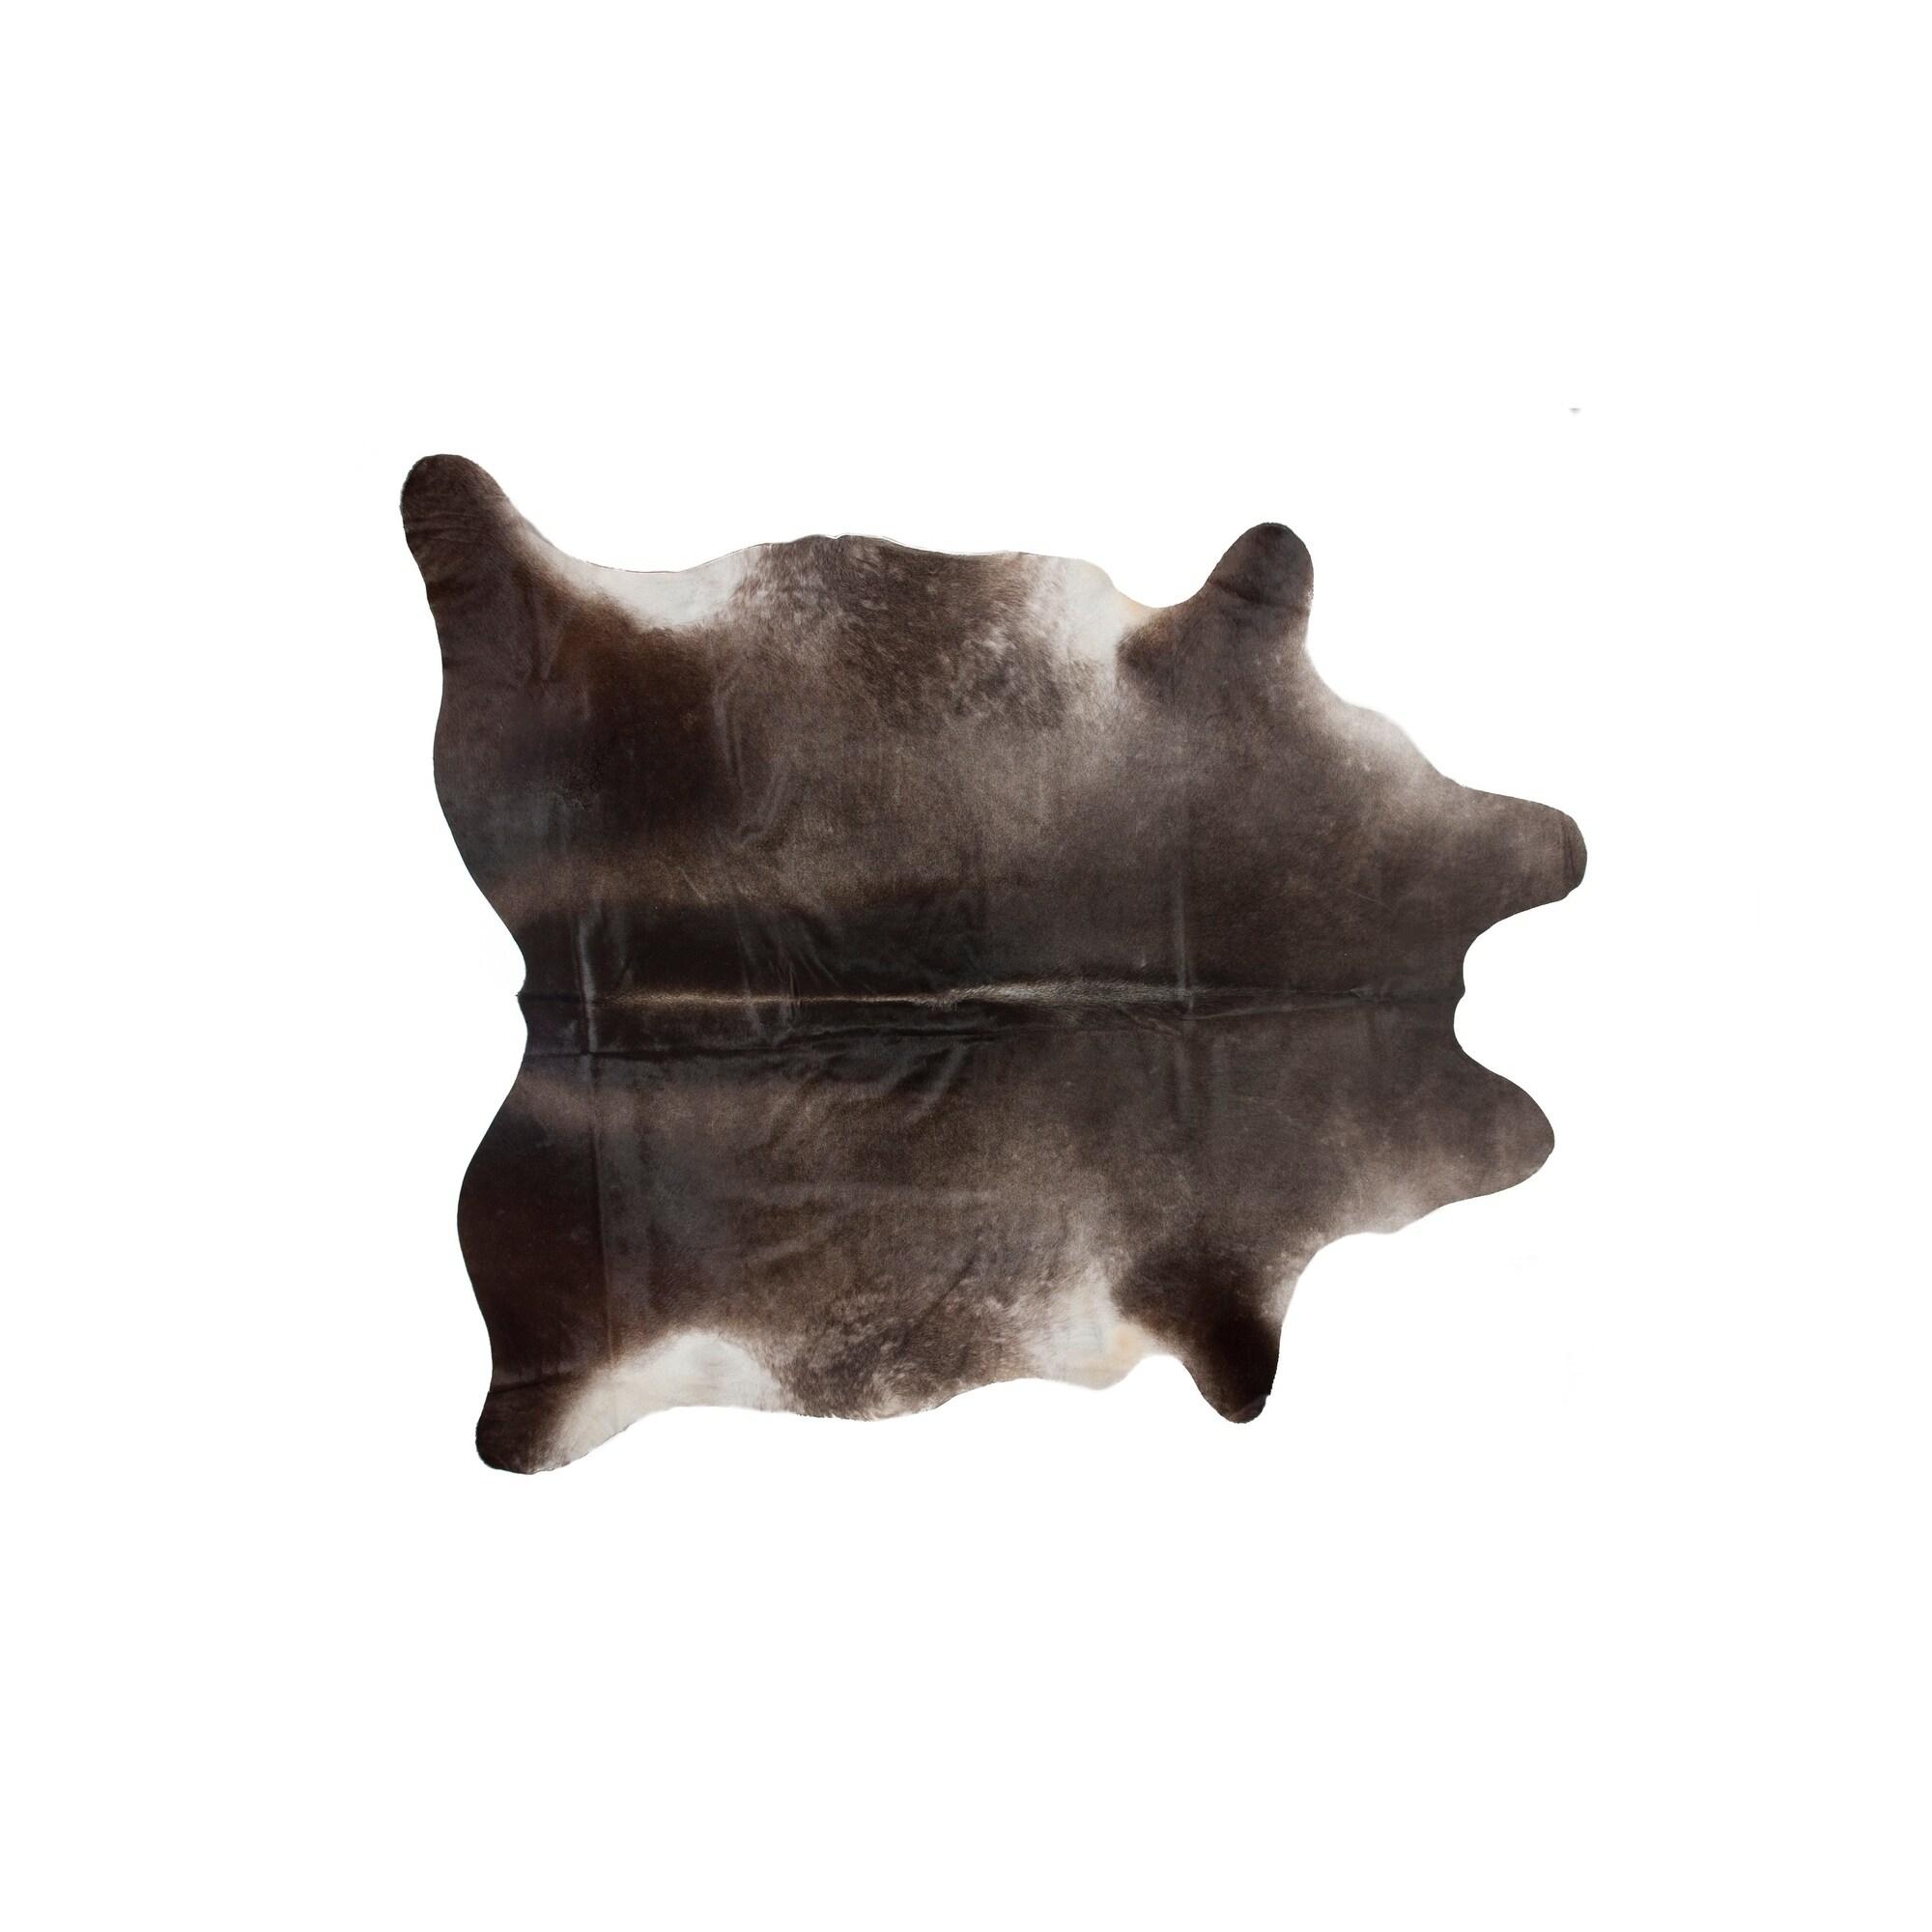 Kobe Cowhide Rug 6x7 White Brown 6 X 7